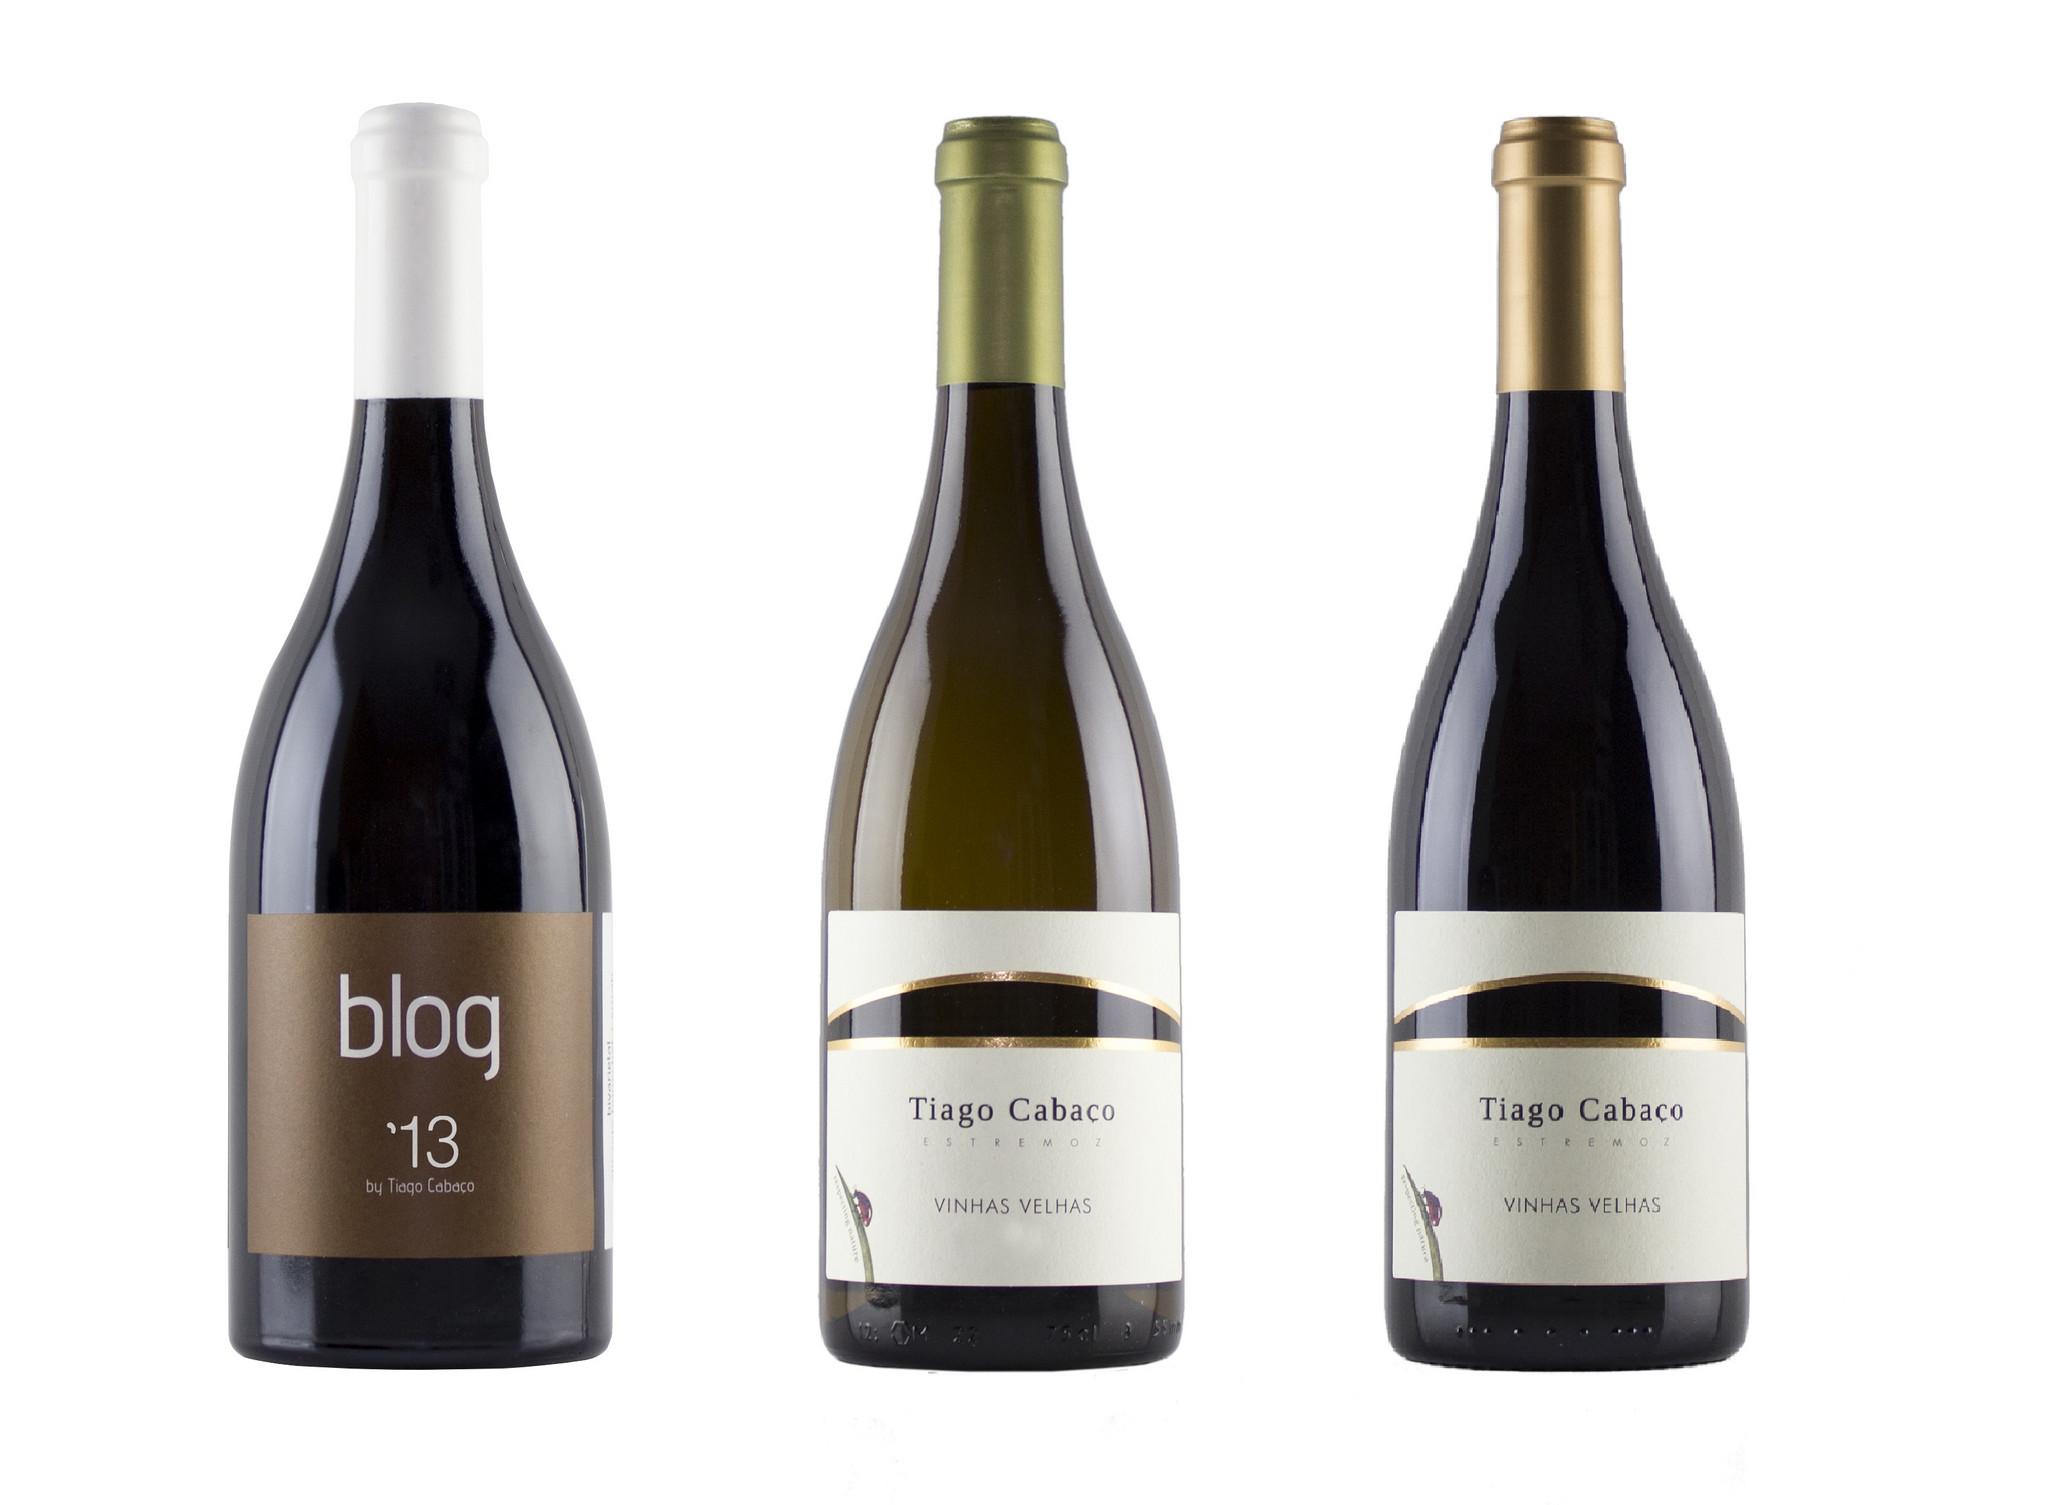 vinhos1272.jpg